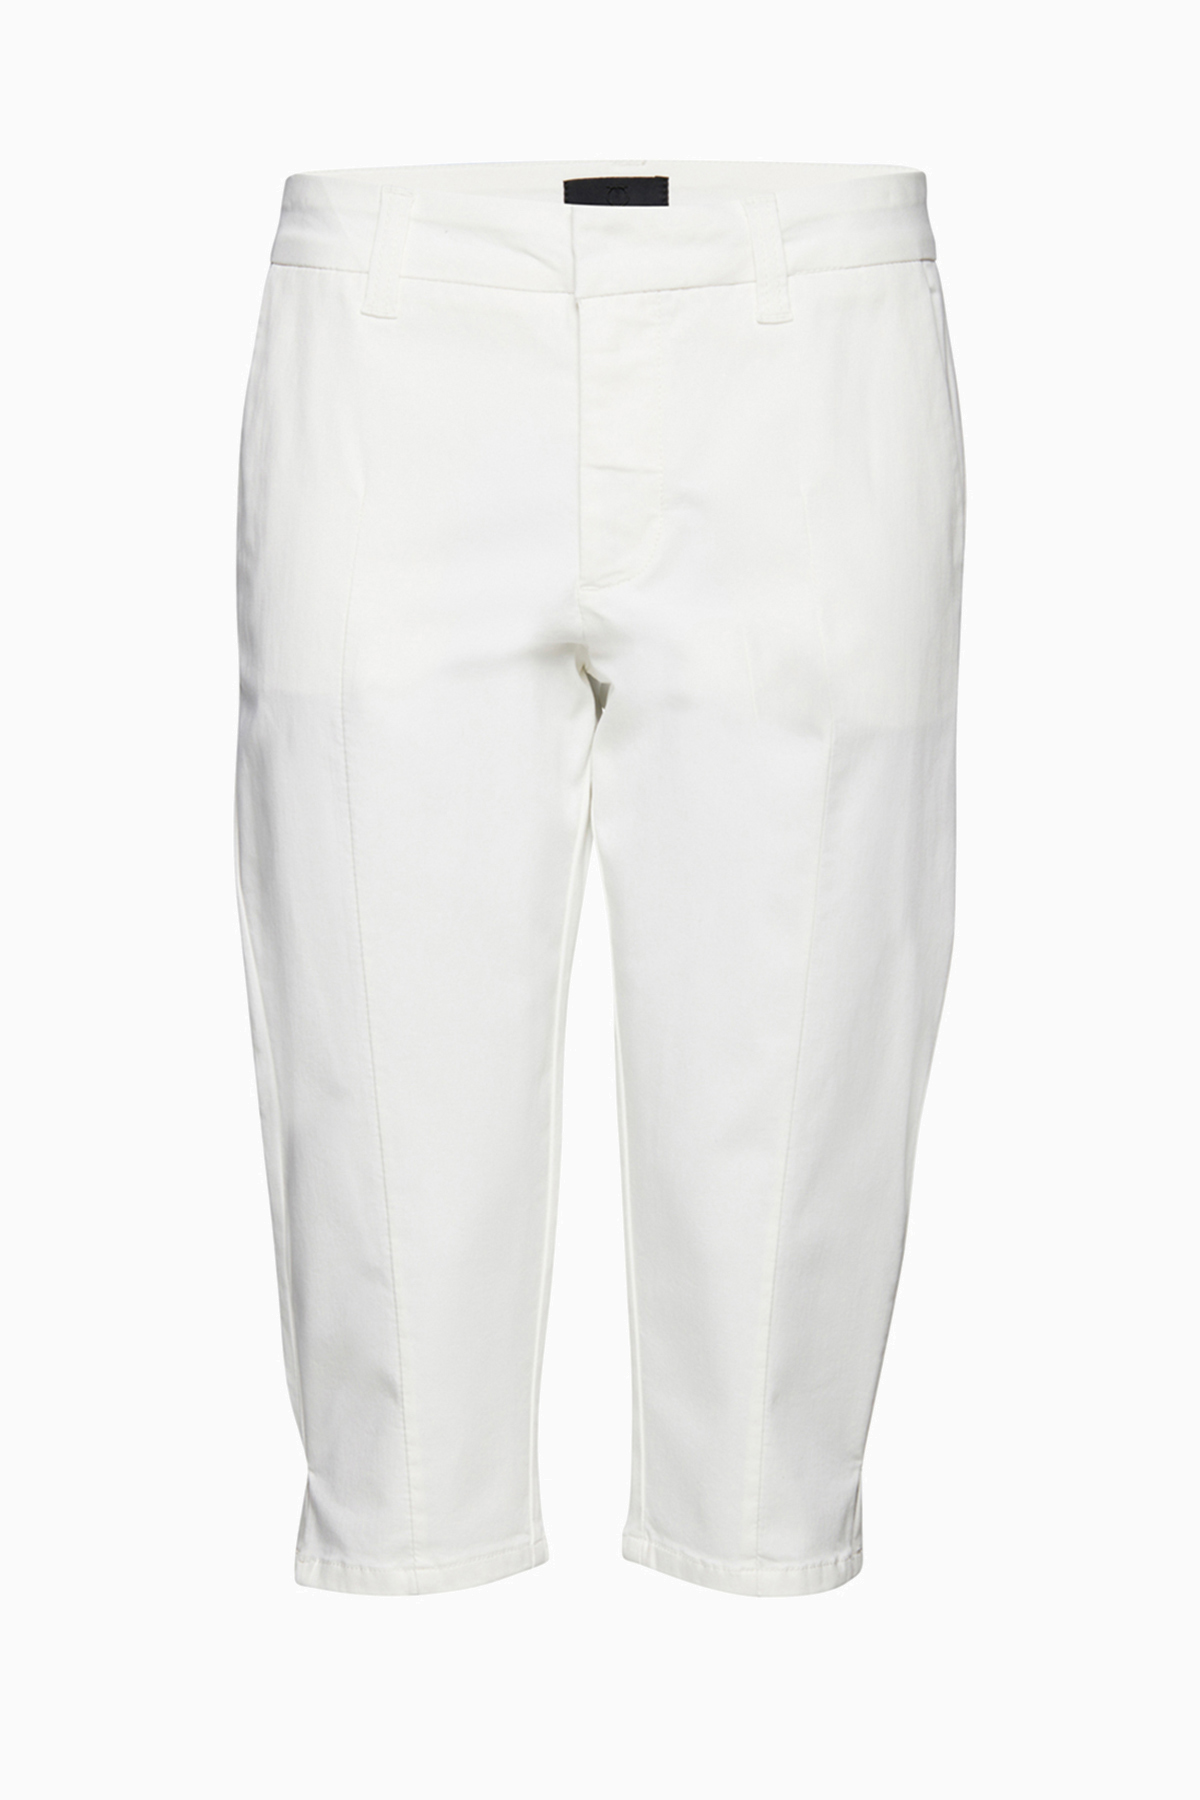 Image of Pulz Jeans Dame Capribuks - Ivory